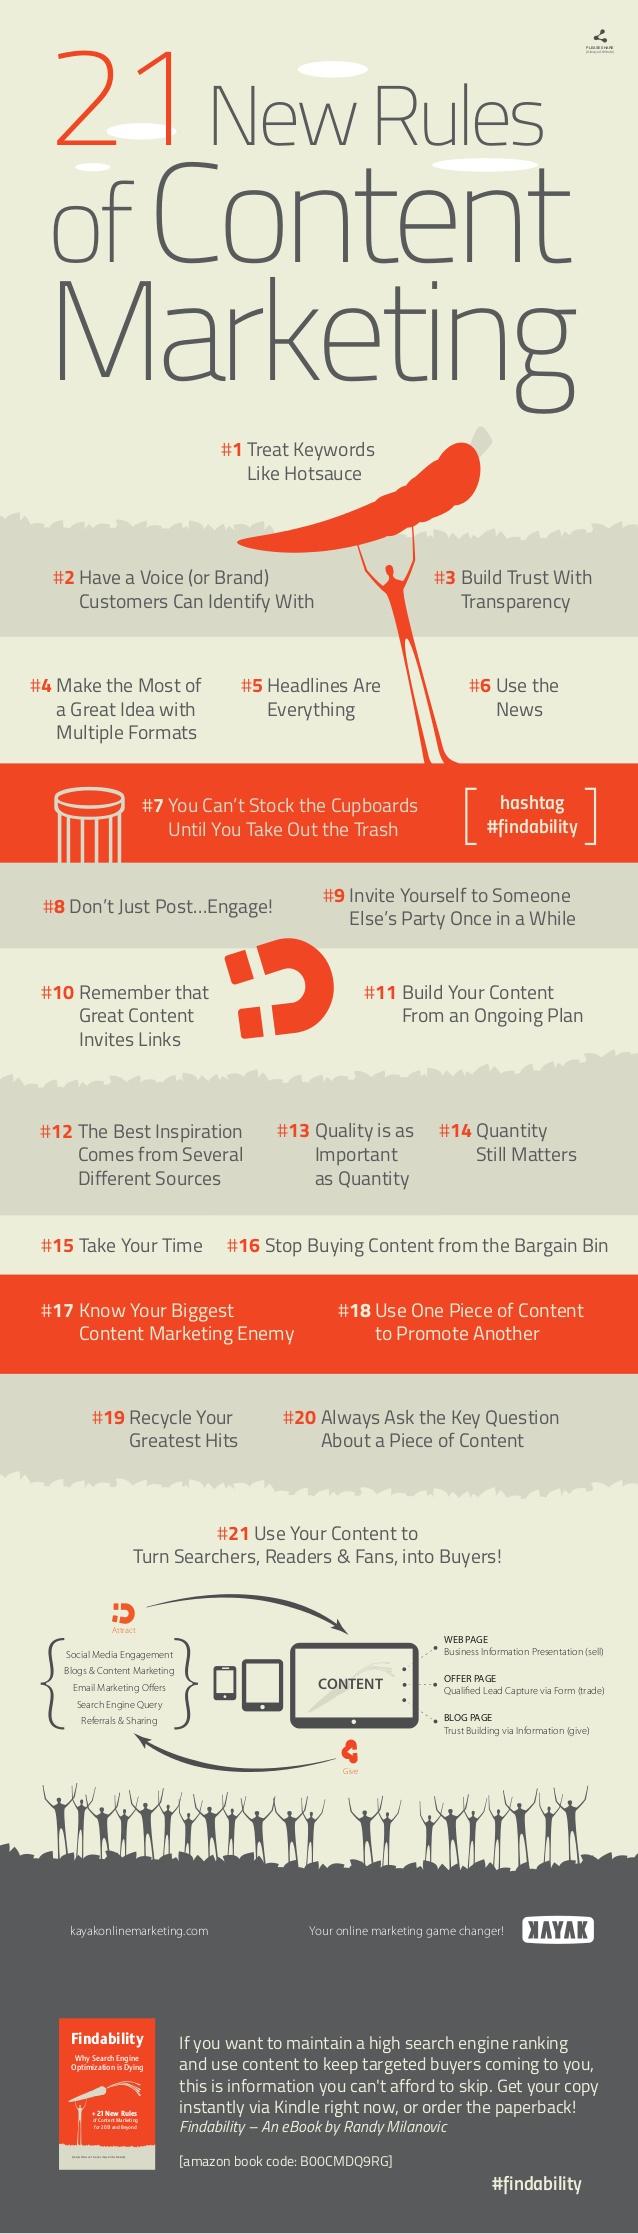 21 content marketing regels